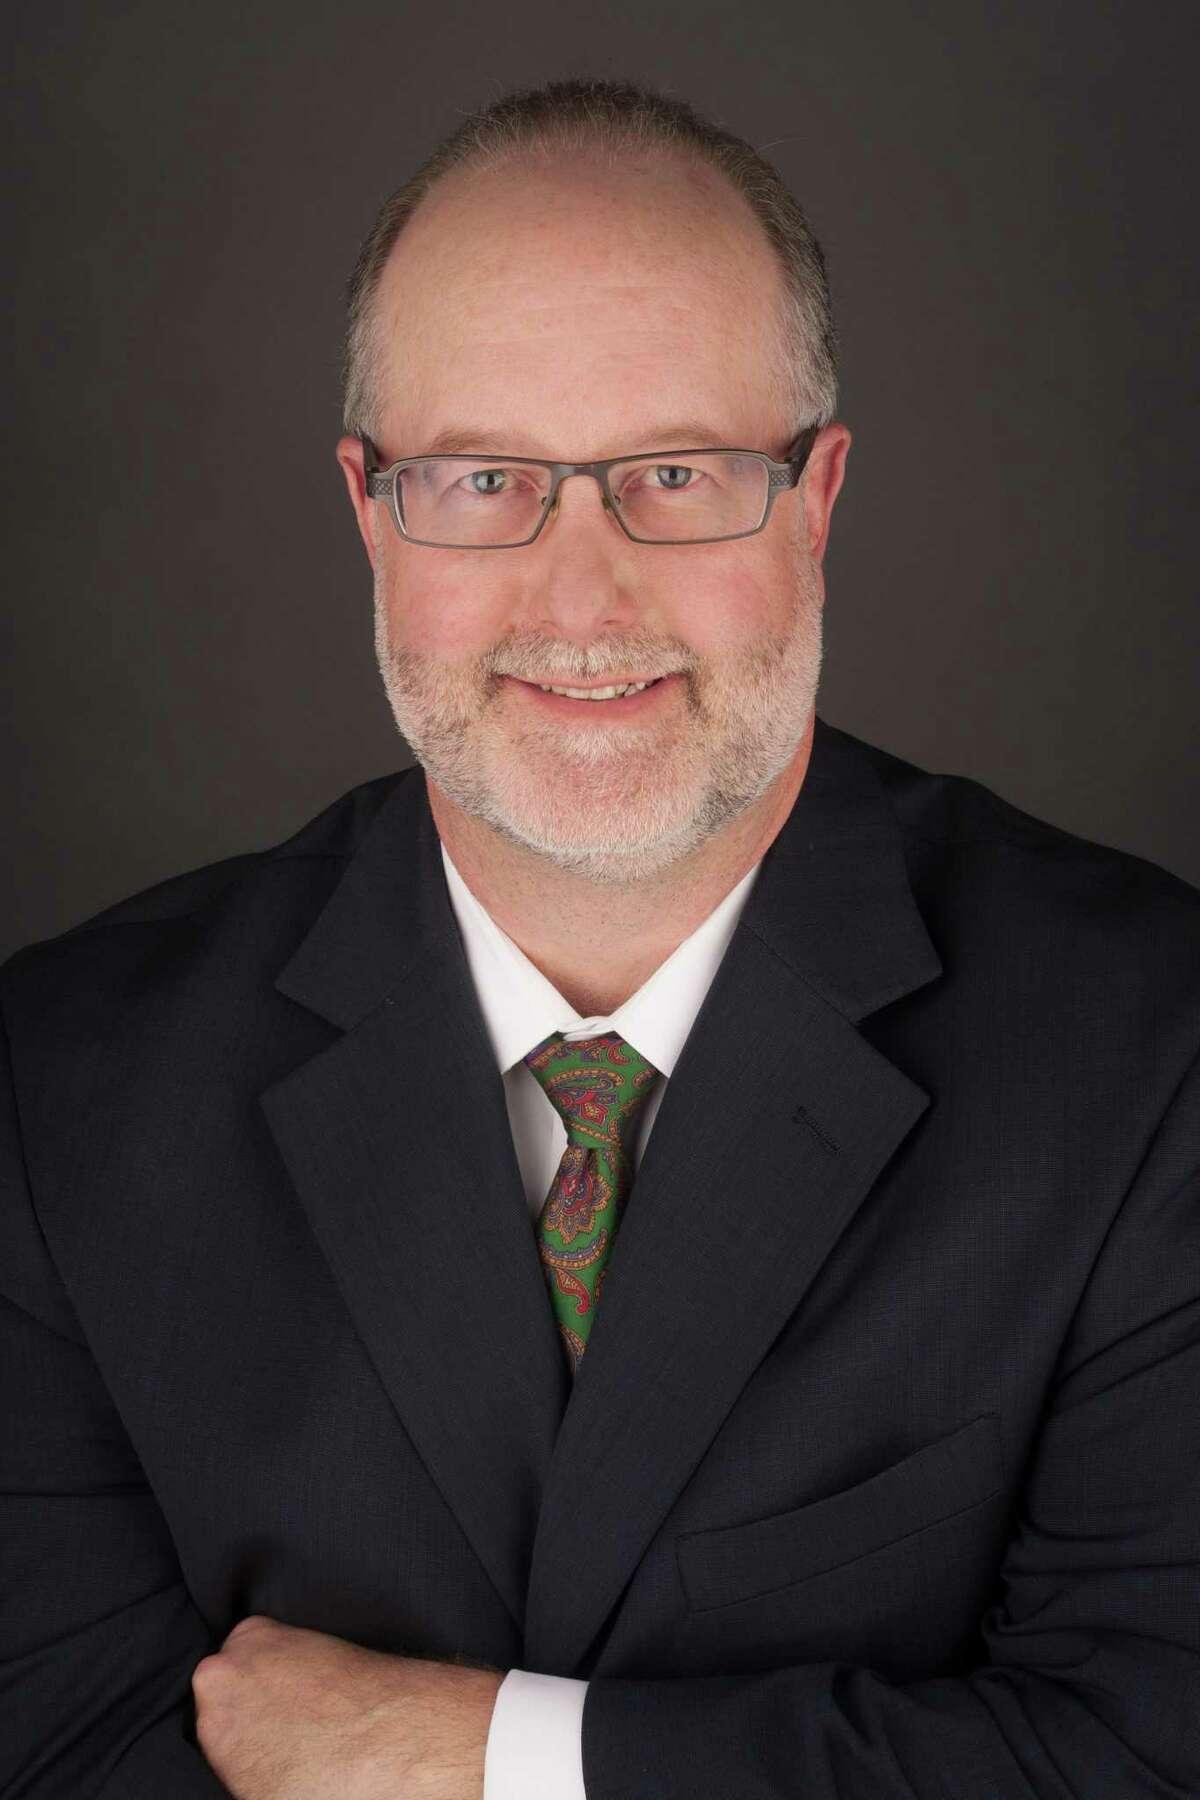 Steve Nivin, an assistant professor of economics at St. Mary's University